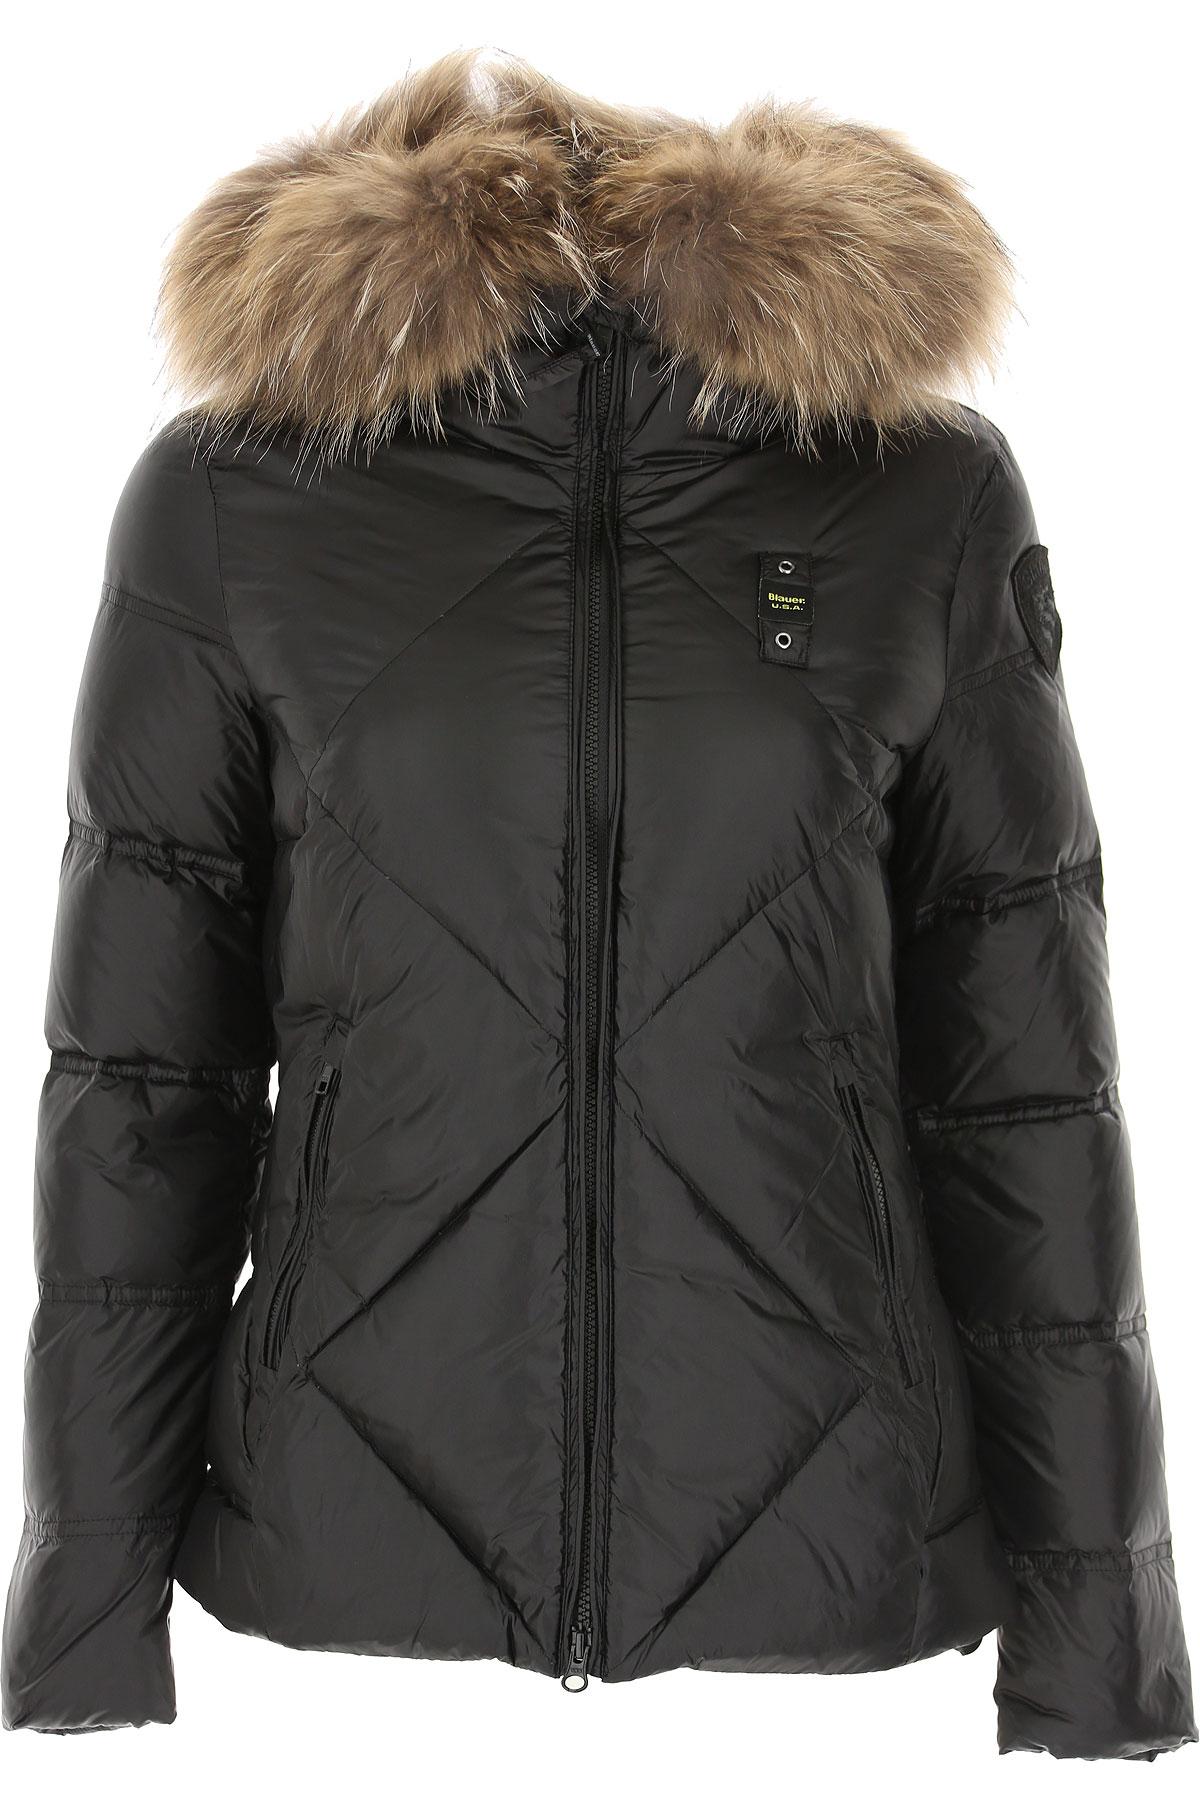 Blauer Down Jacket for Women, Puffer Ski Jacket On Sale, Black, polyester, 2019, 10 2 4 6